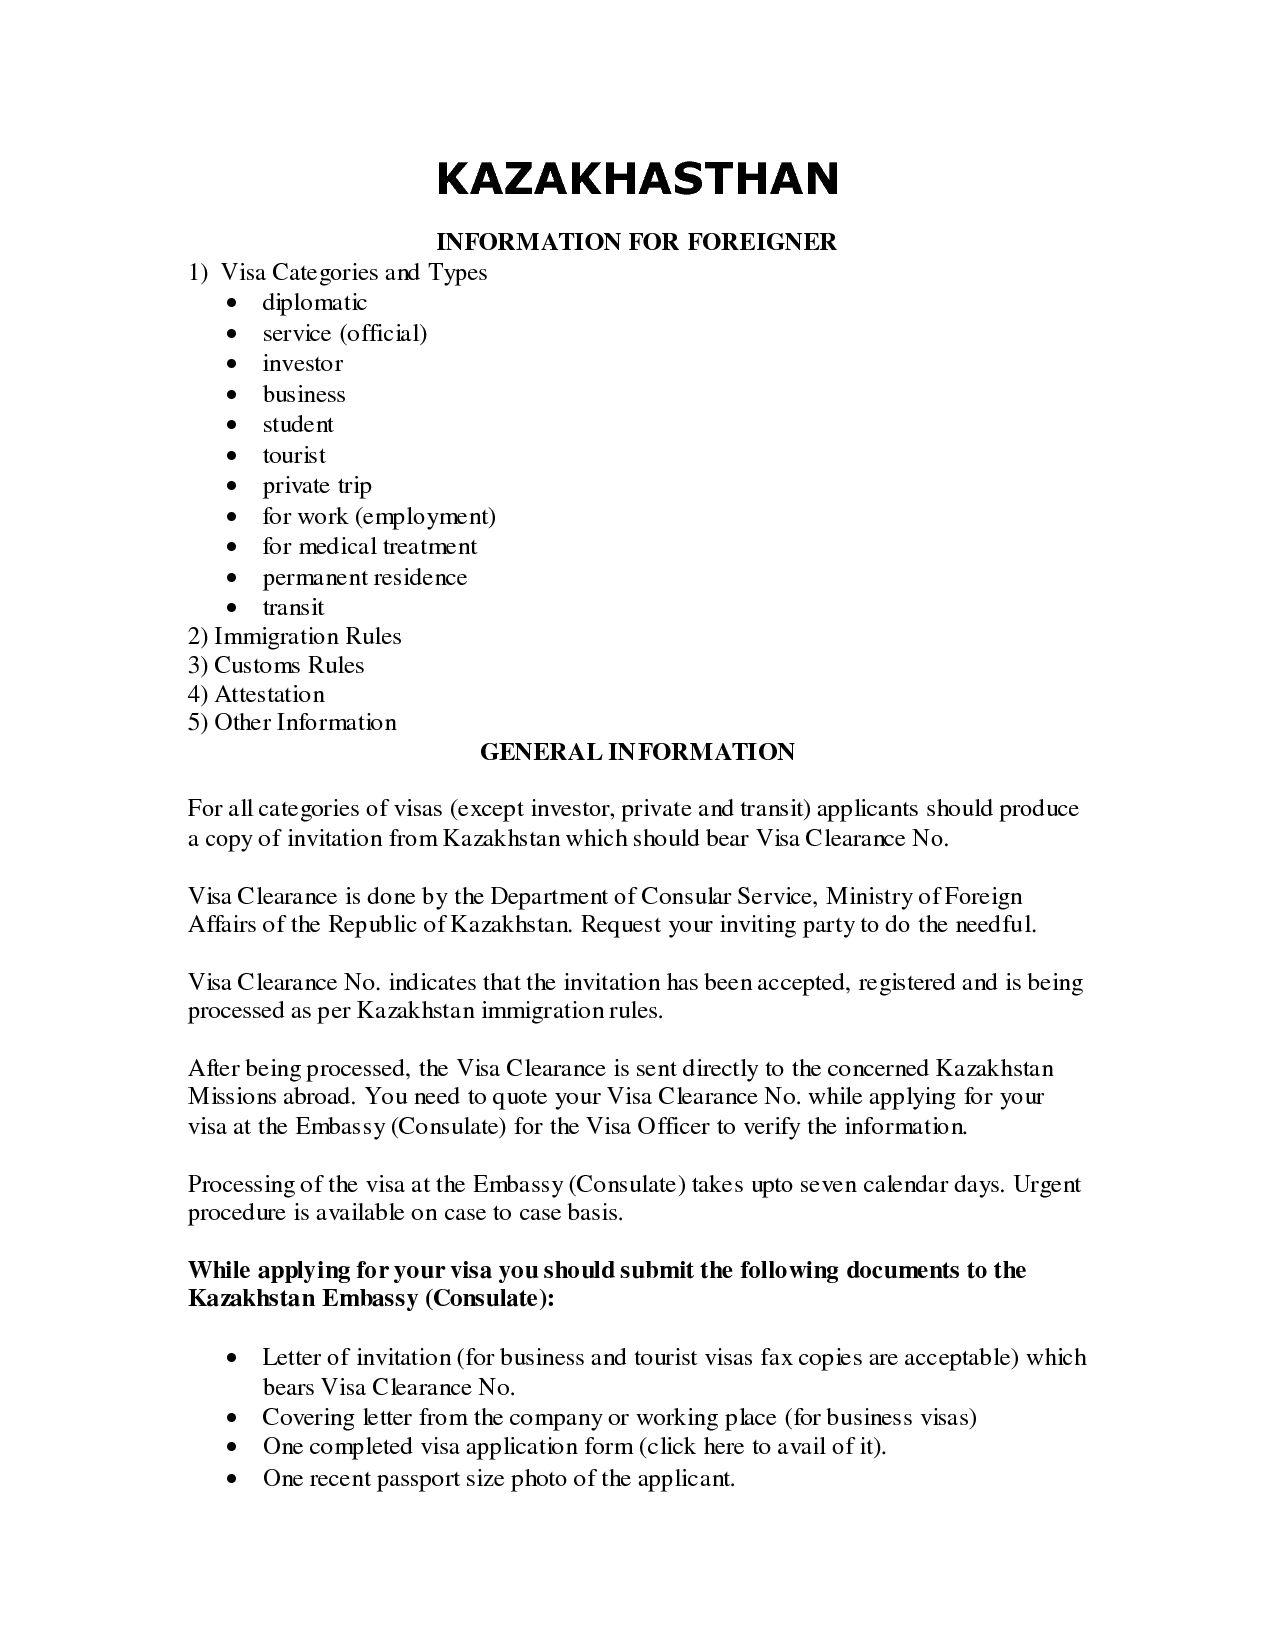 Sample covering letter for singapore tourist visa pre sales sample covering letter for singapore tourist visa pre sales invitation canada wedding stopboris Choice Image